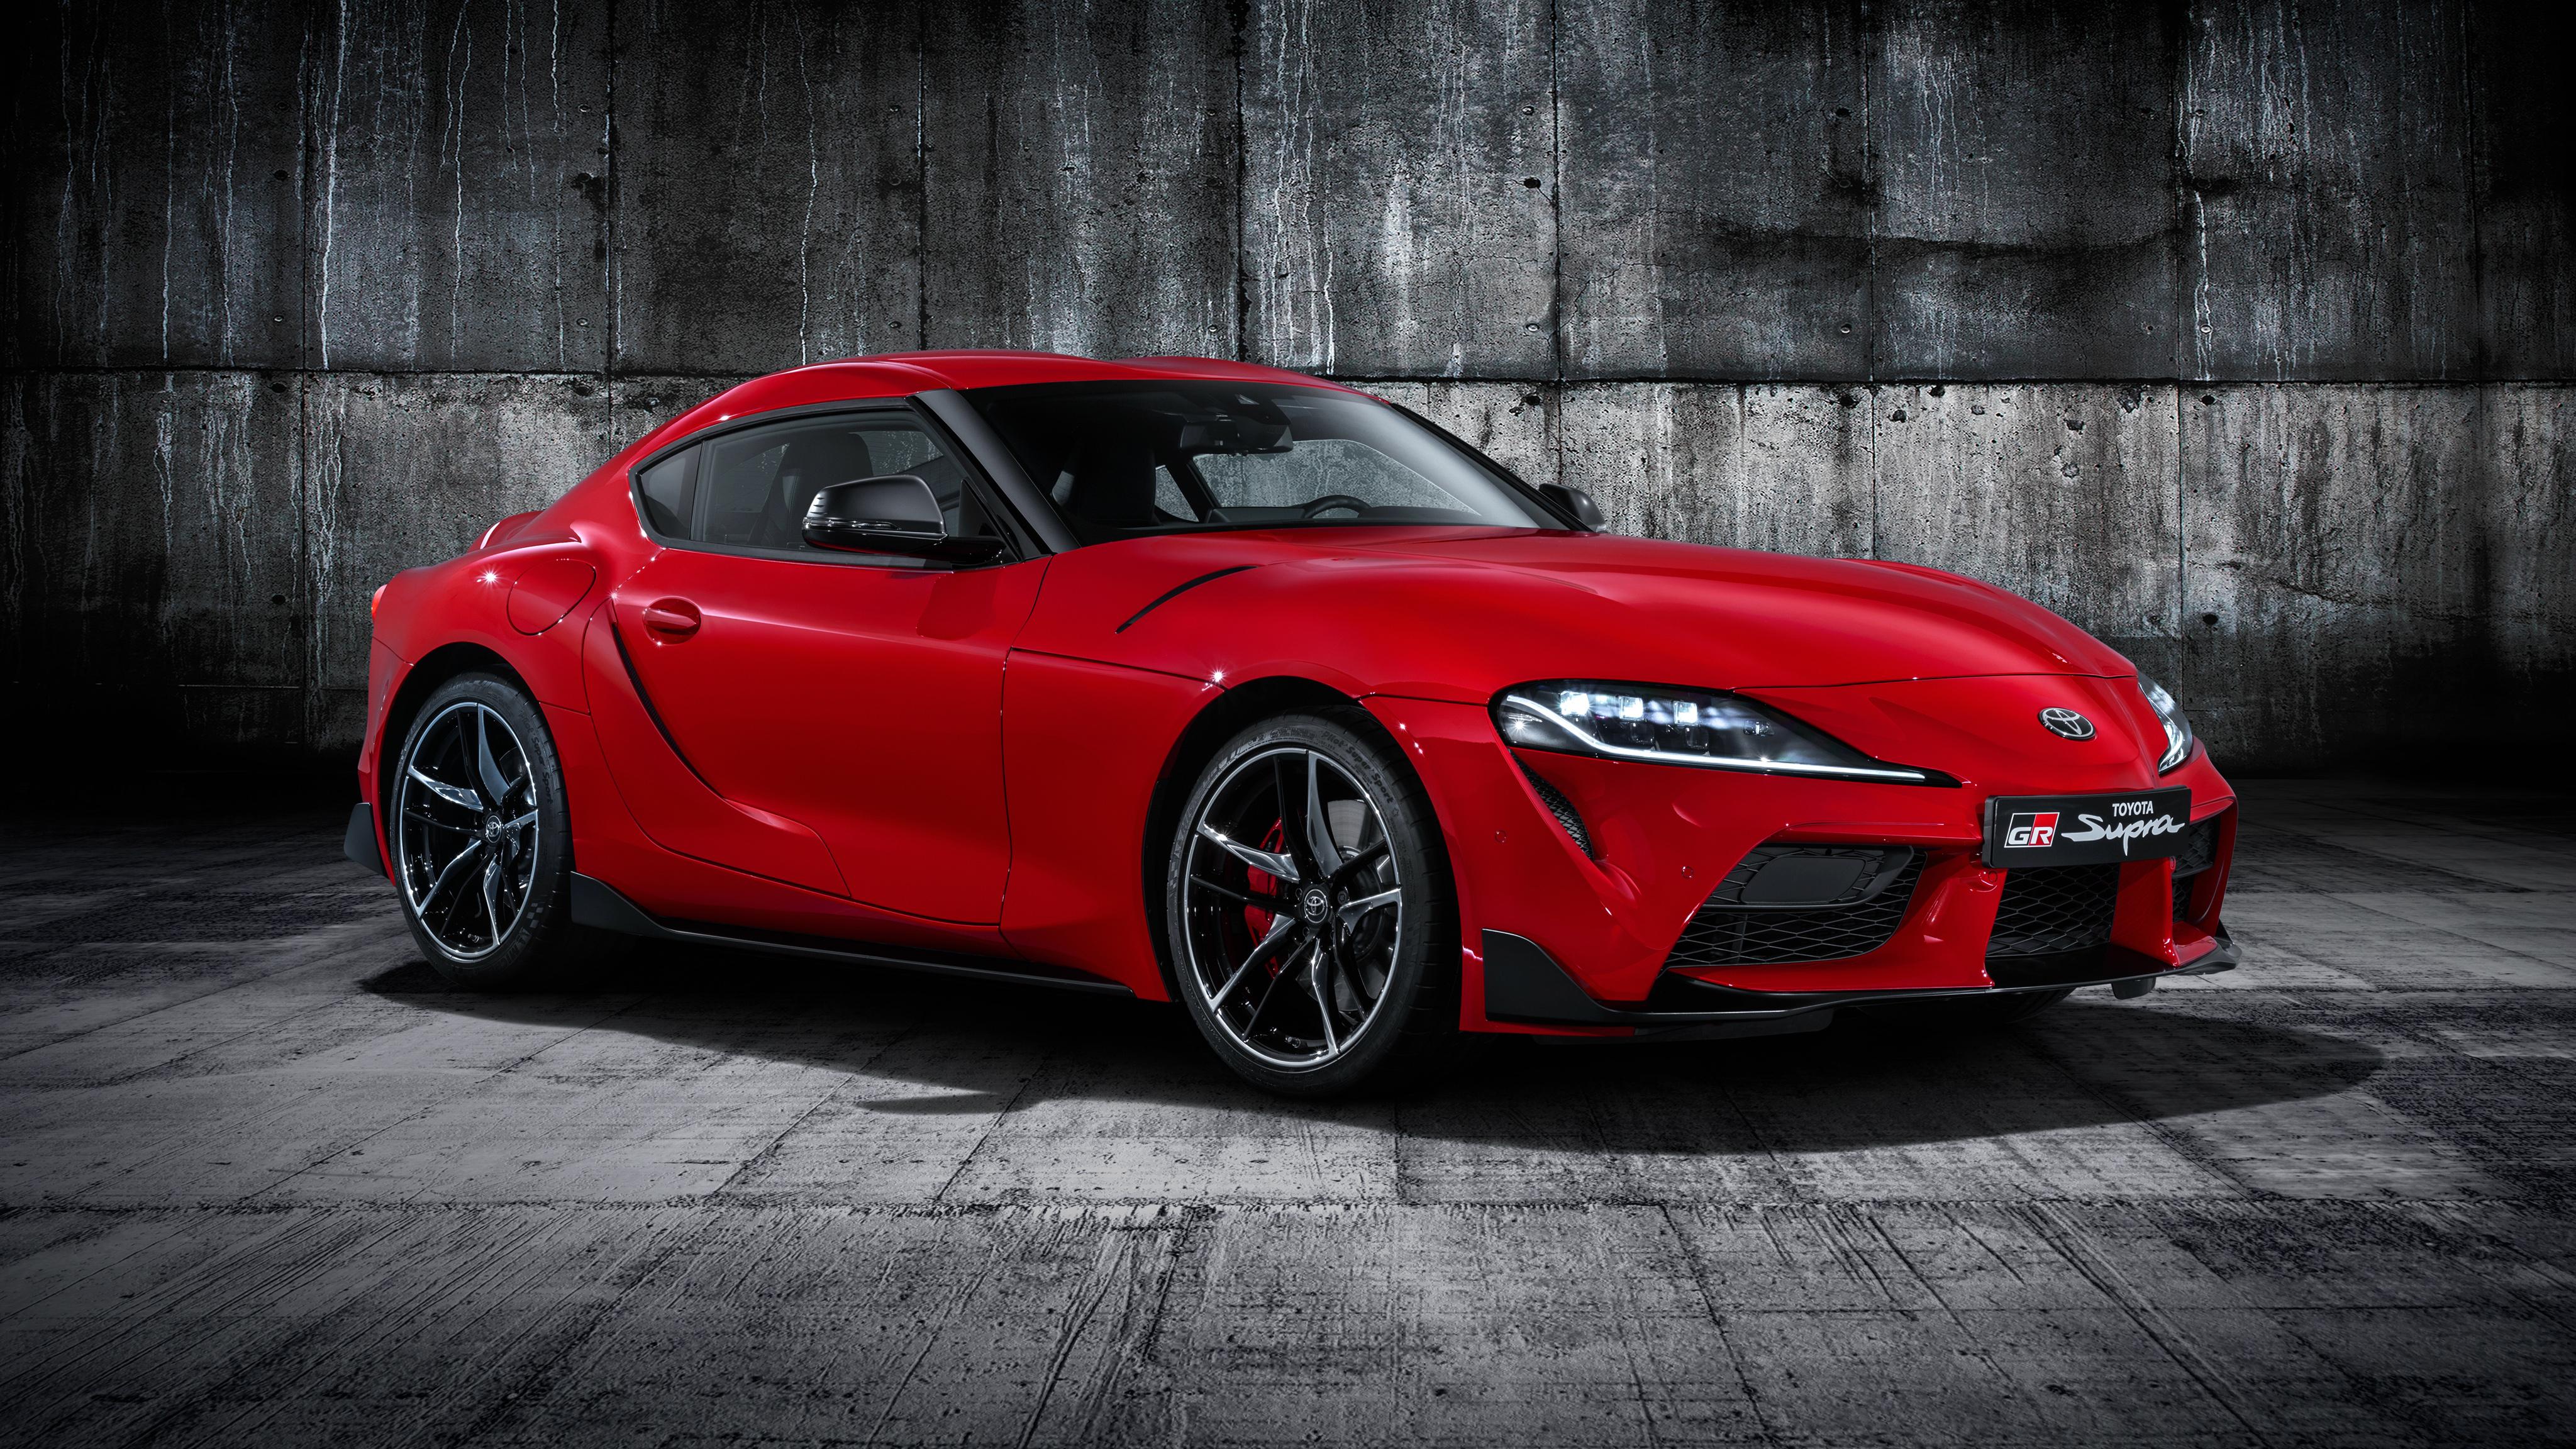 Toyota GR Supra 2019 4K Wallpaper | HD Car Wallpapers | ID ...